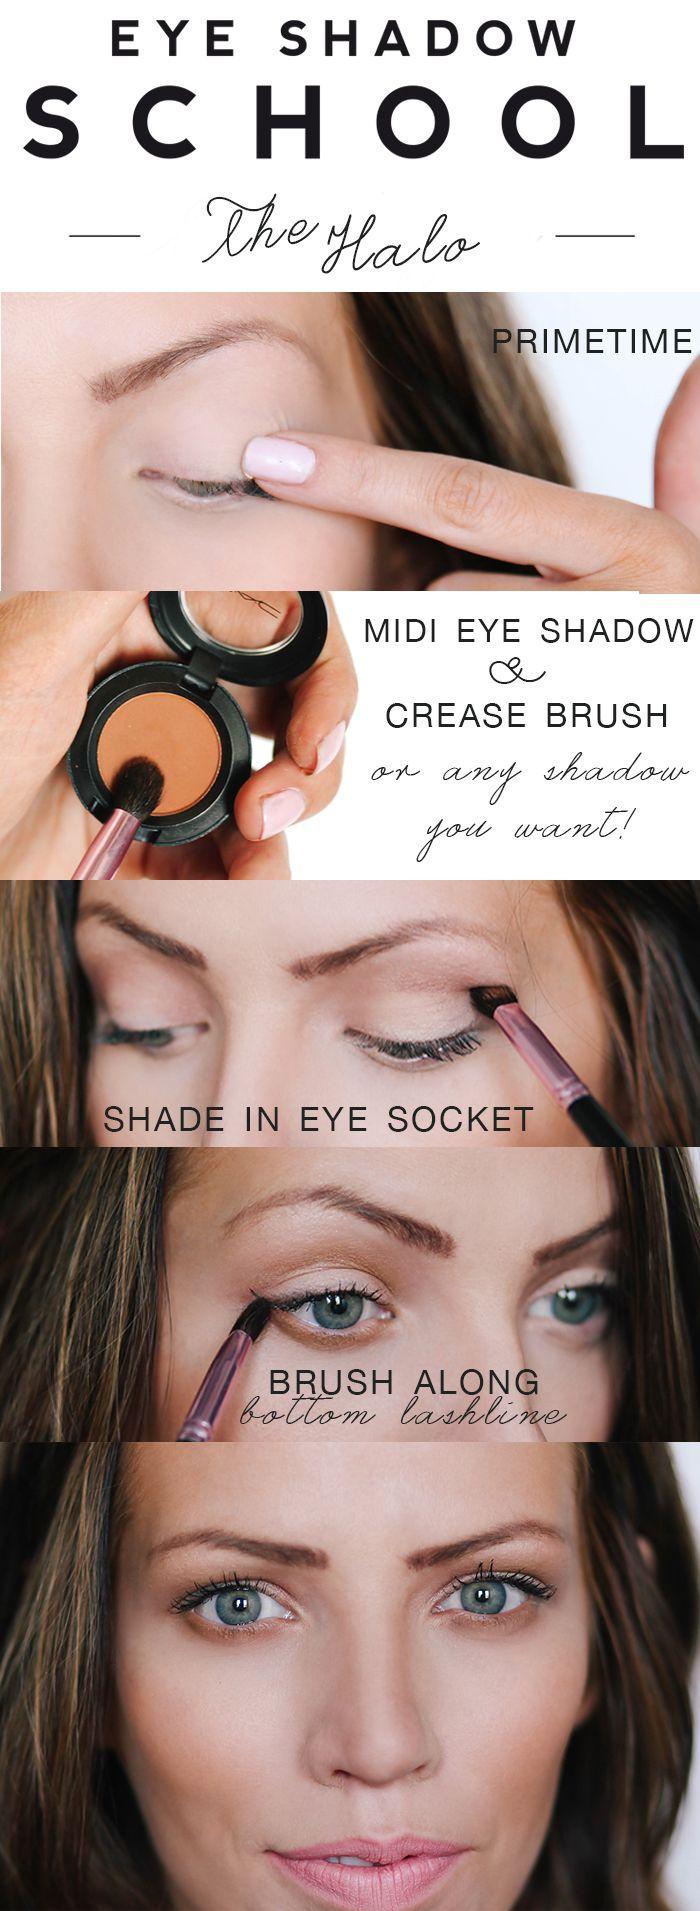 Eyeshadow school- natural and easy eye makeup routine.